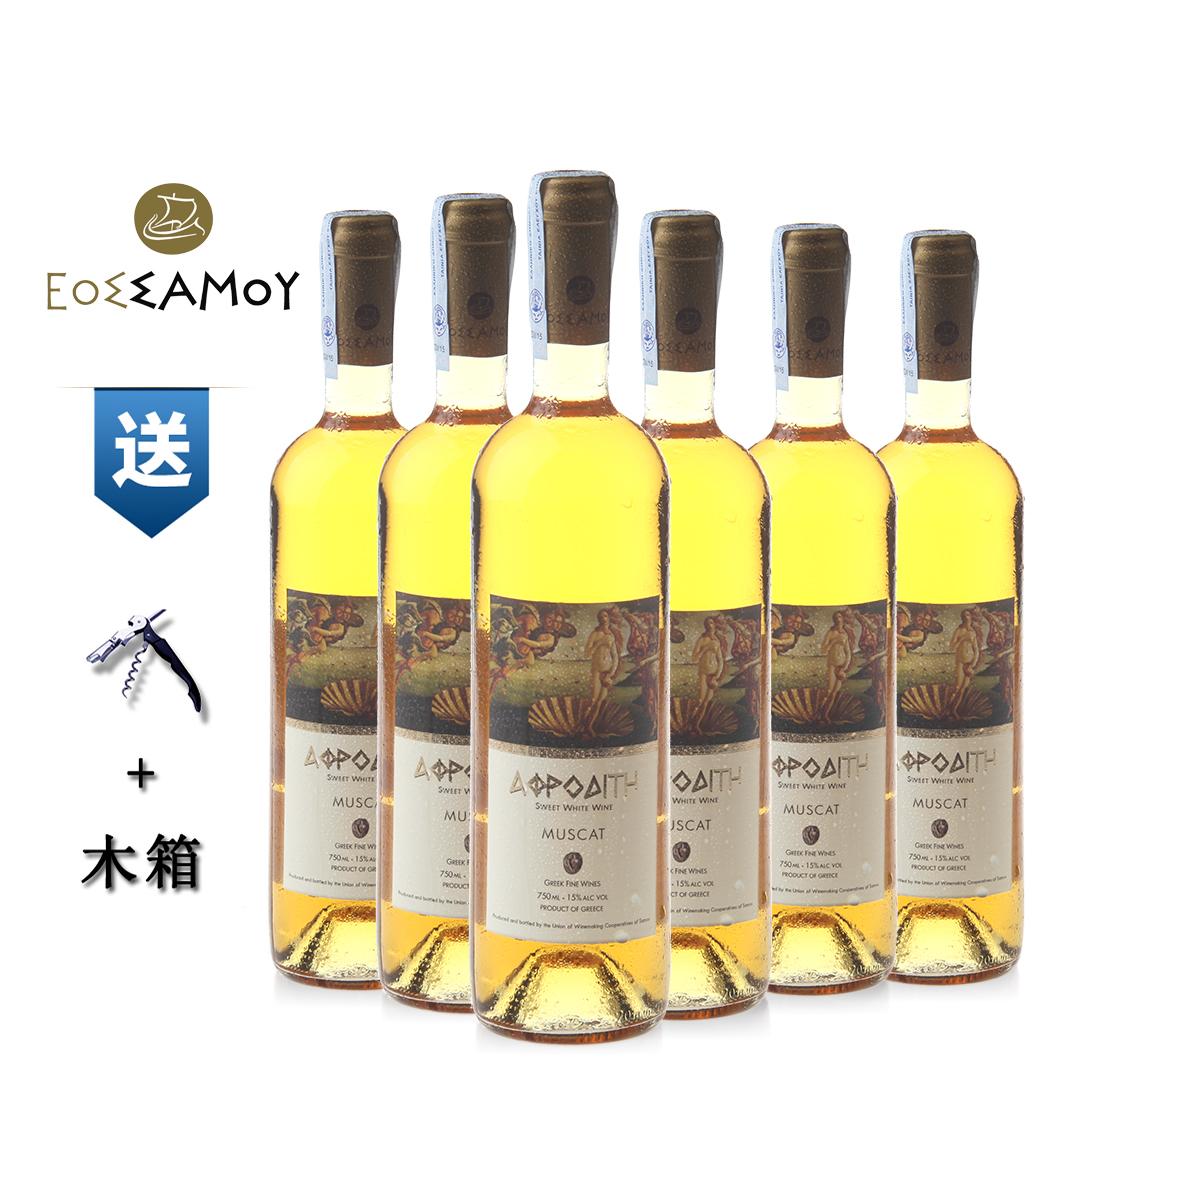 APHRODITE 美神麝香甜白葡萄酒